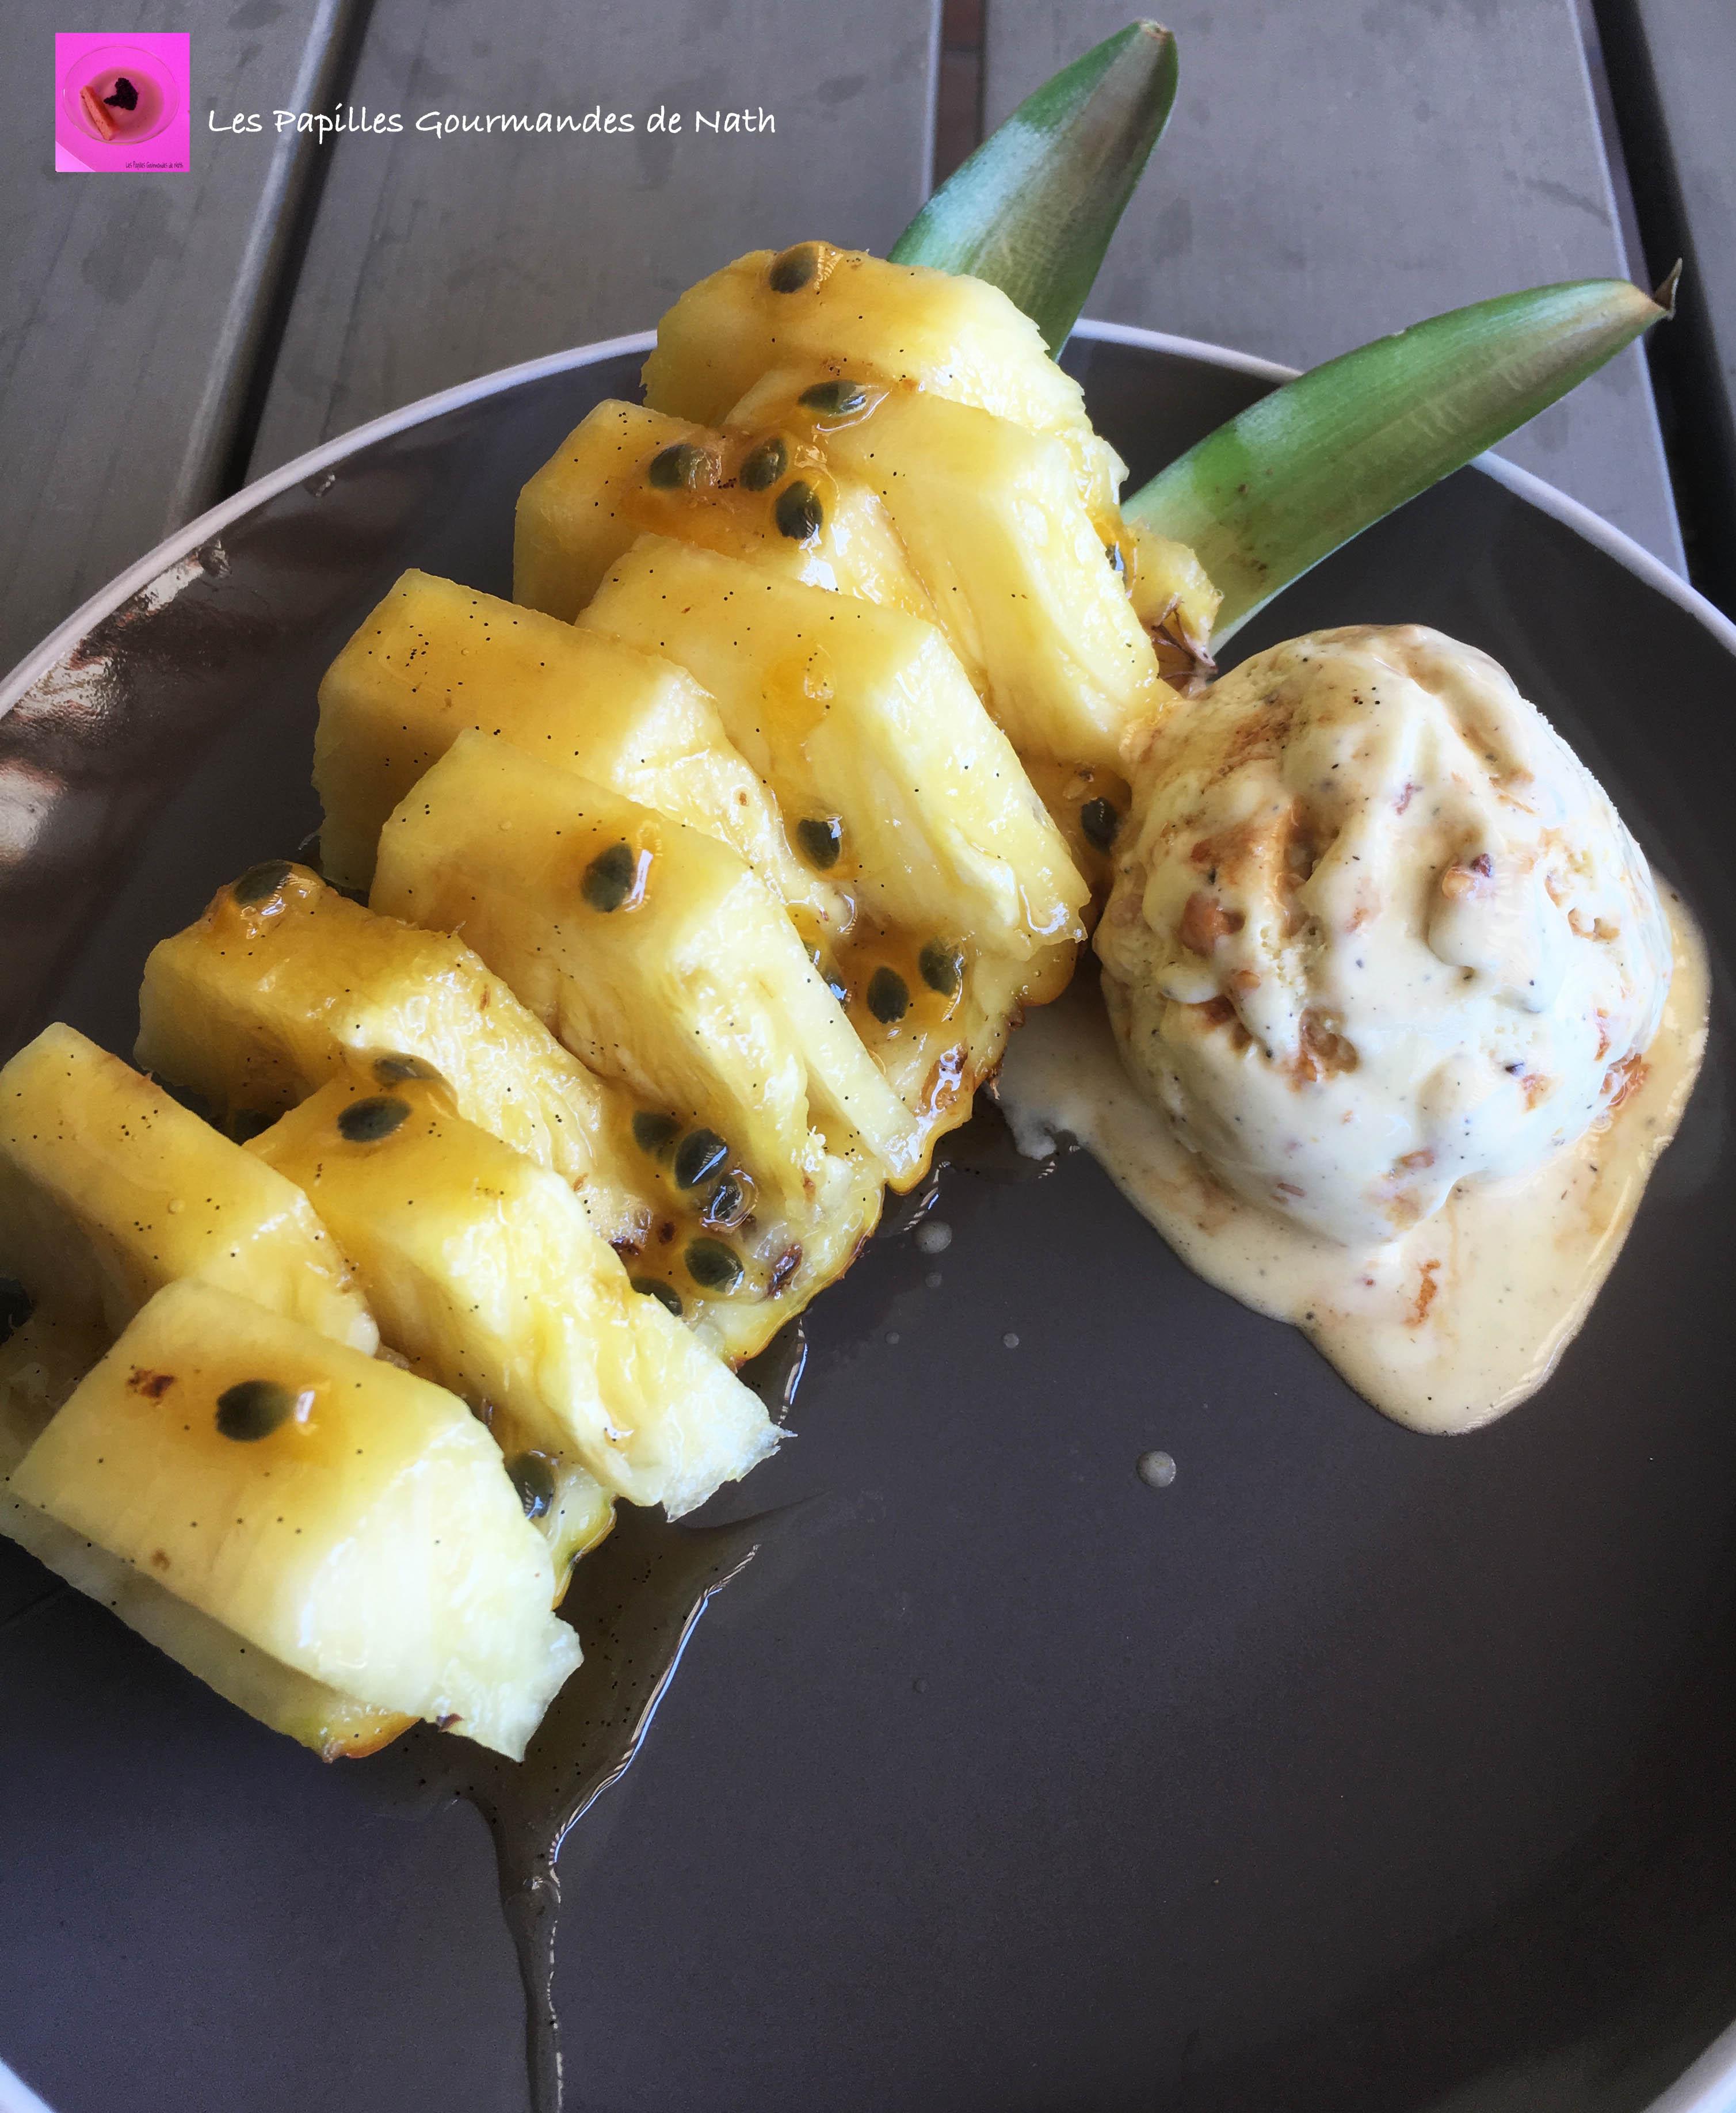 Ananas sirop rhum vanille passion et glace vanille